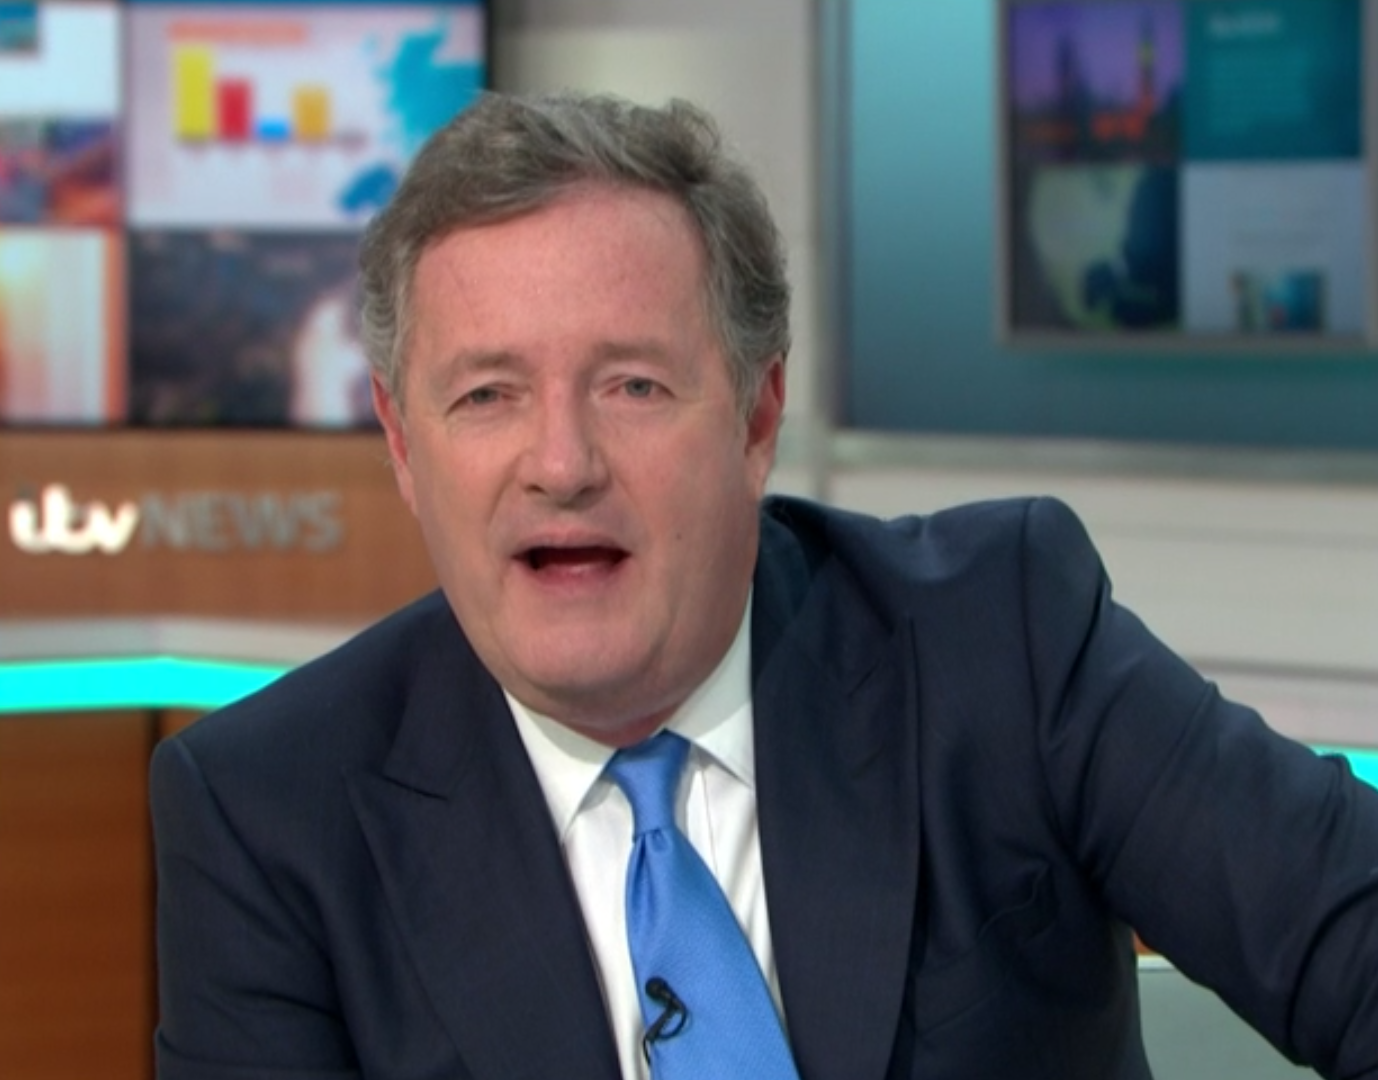 Piers Morgan GMB fat shamed